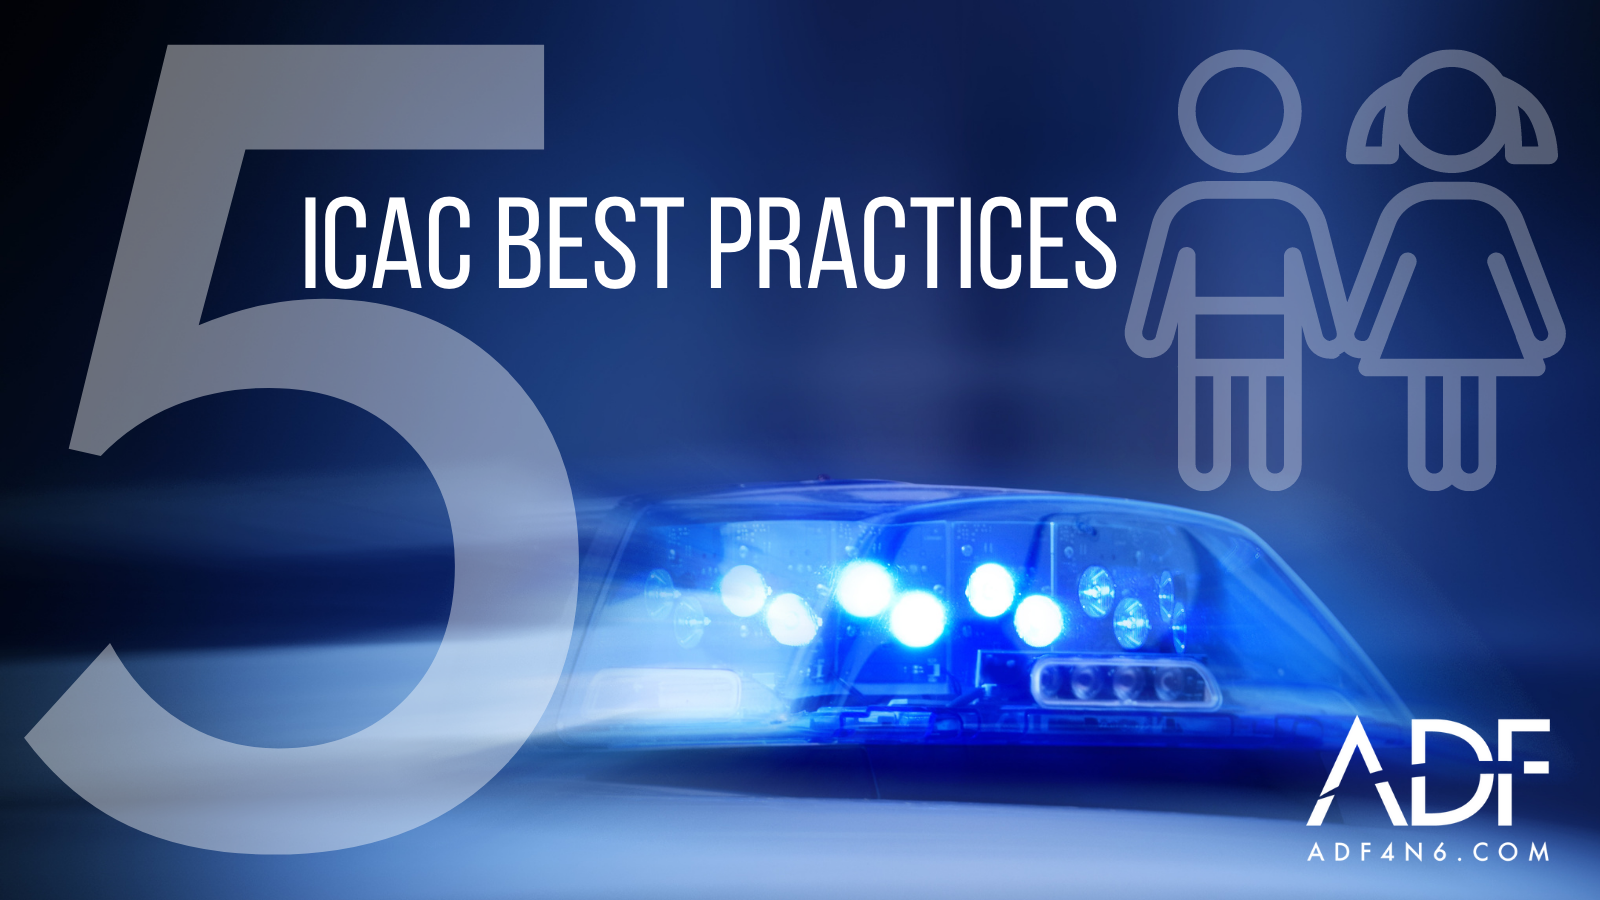 5 ICAC Investigation Best Practices